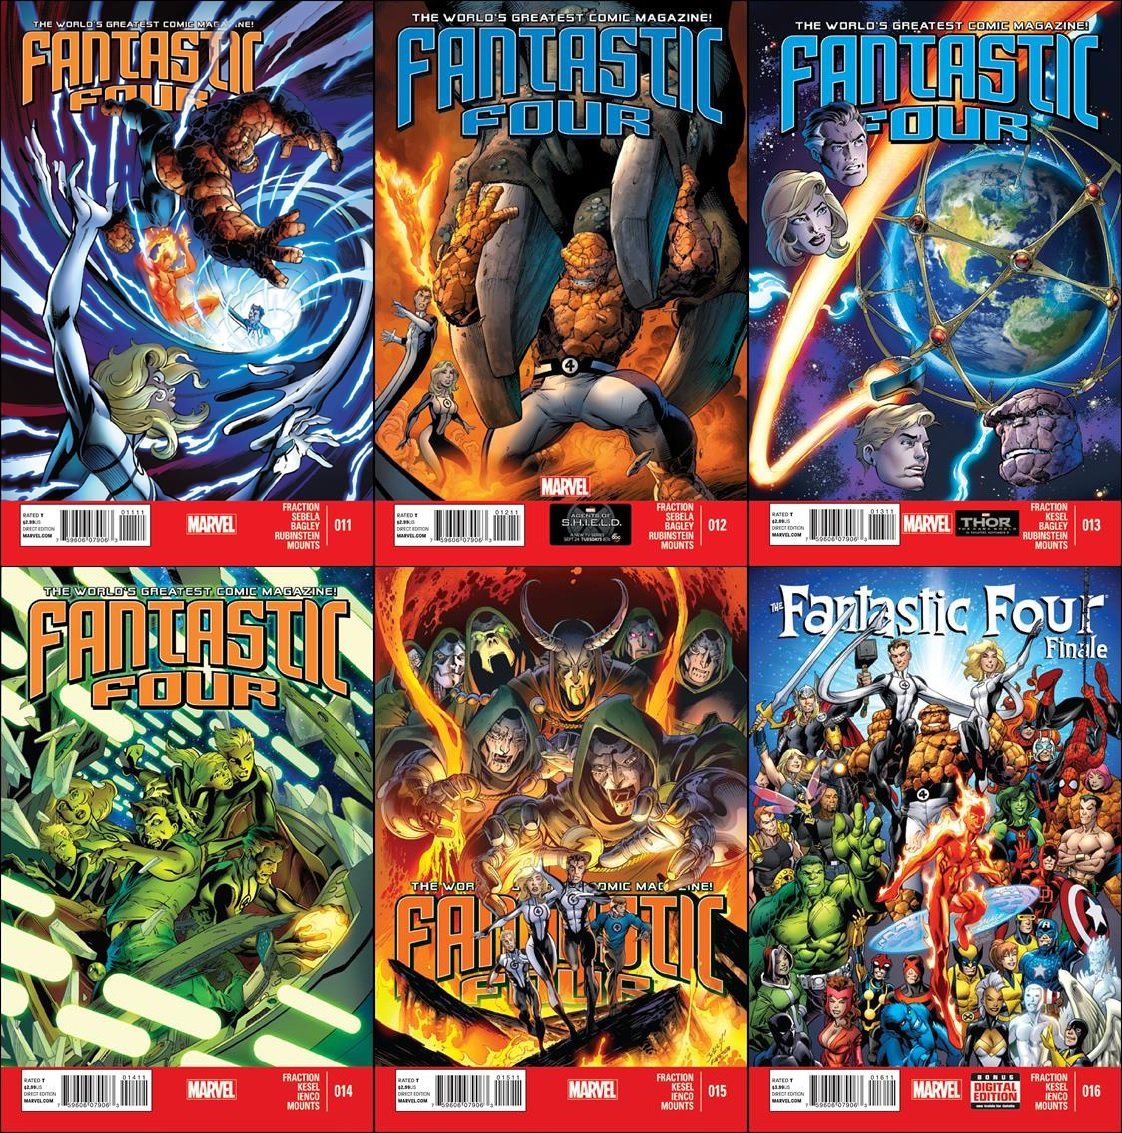 Fantastic Four (Vol 4) #11 12 13 14 15 16 (2013) VF/NM * Marvel Now Trade Set * Series Finale *